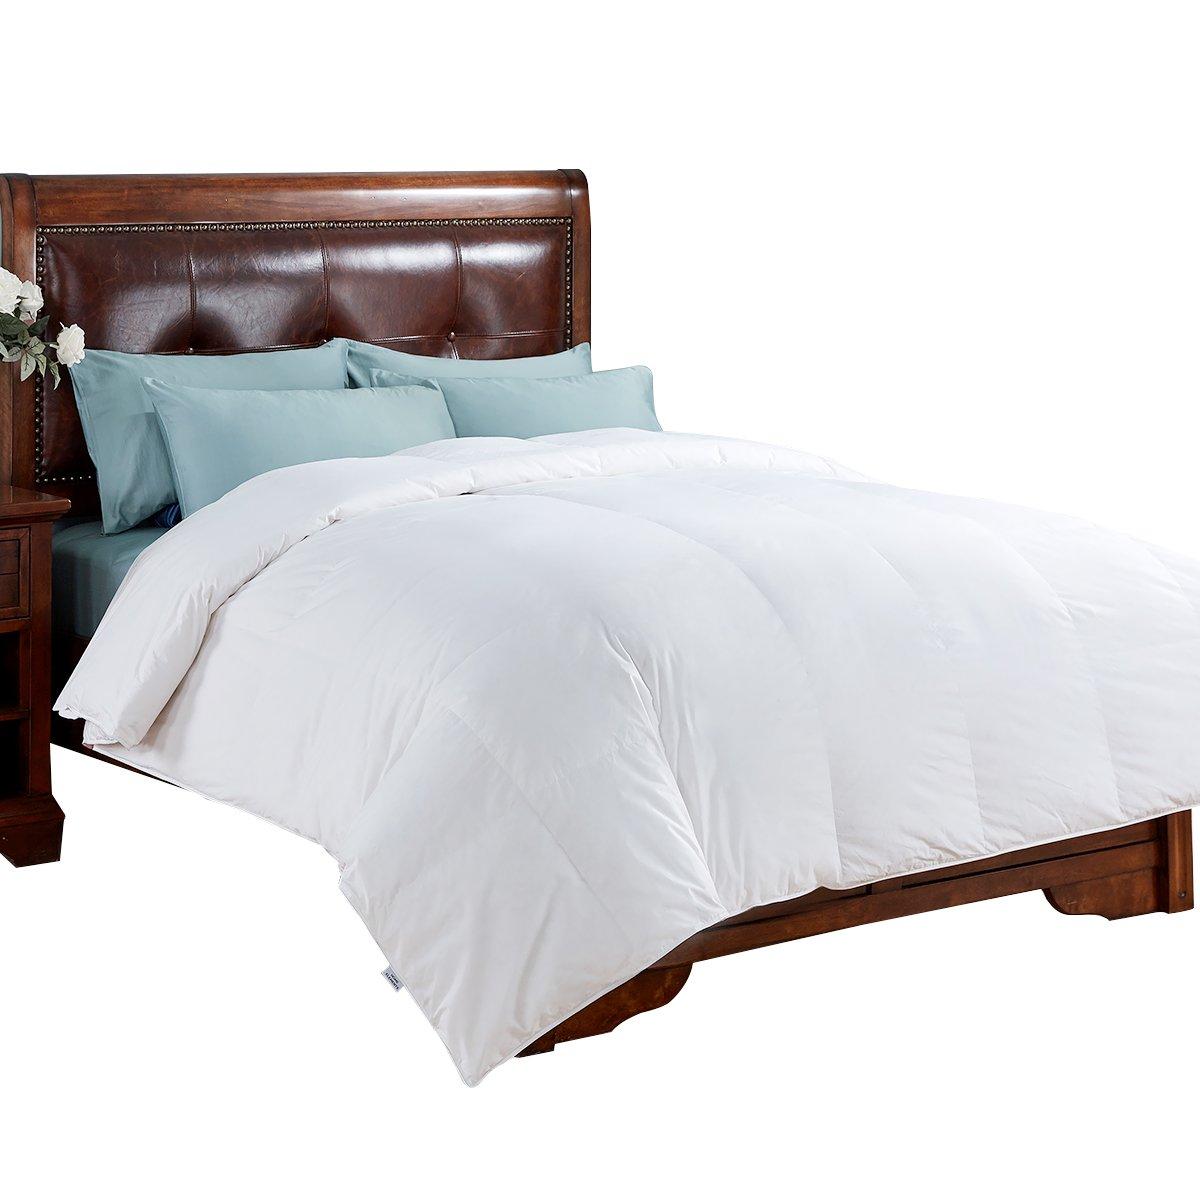 PEACE NEST All Season Comforter White Goose Down with 100% Cotton Cover Reversible Comforter Duvet White Full/Queen Size